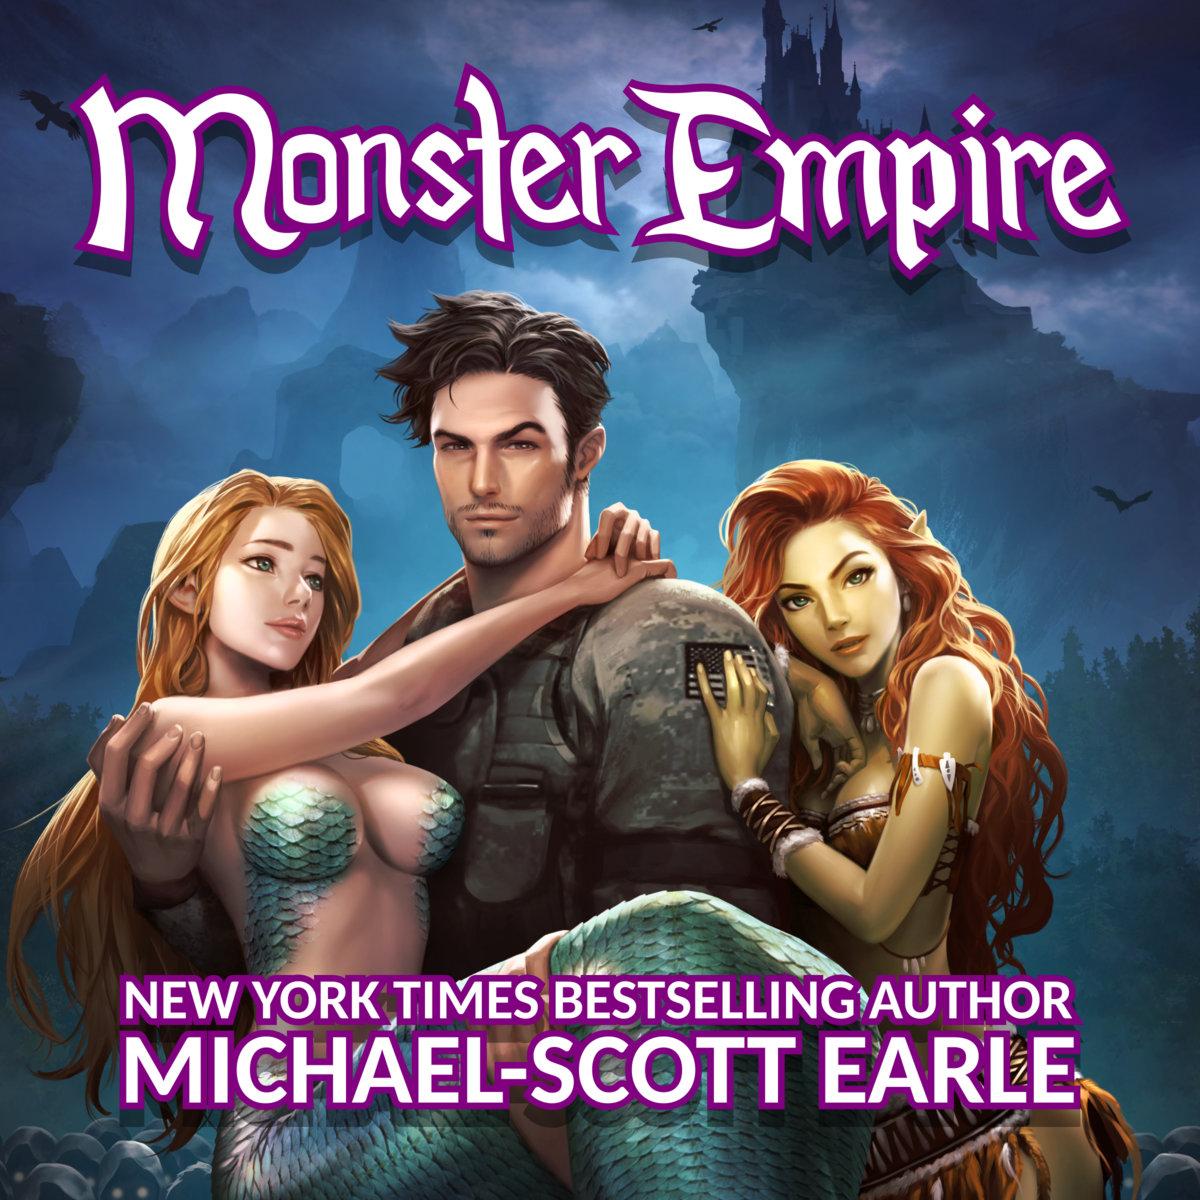 Monster Empire Book 1 - Michael-Scott Earle, Bandcamp